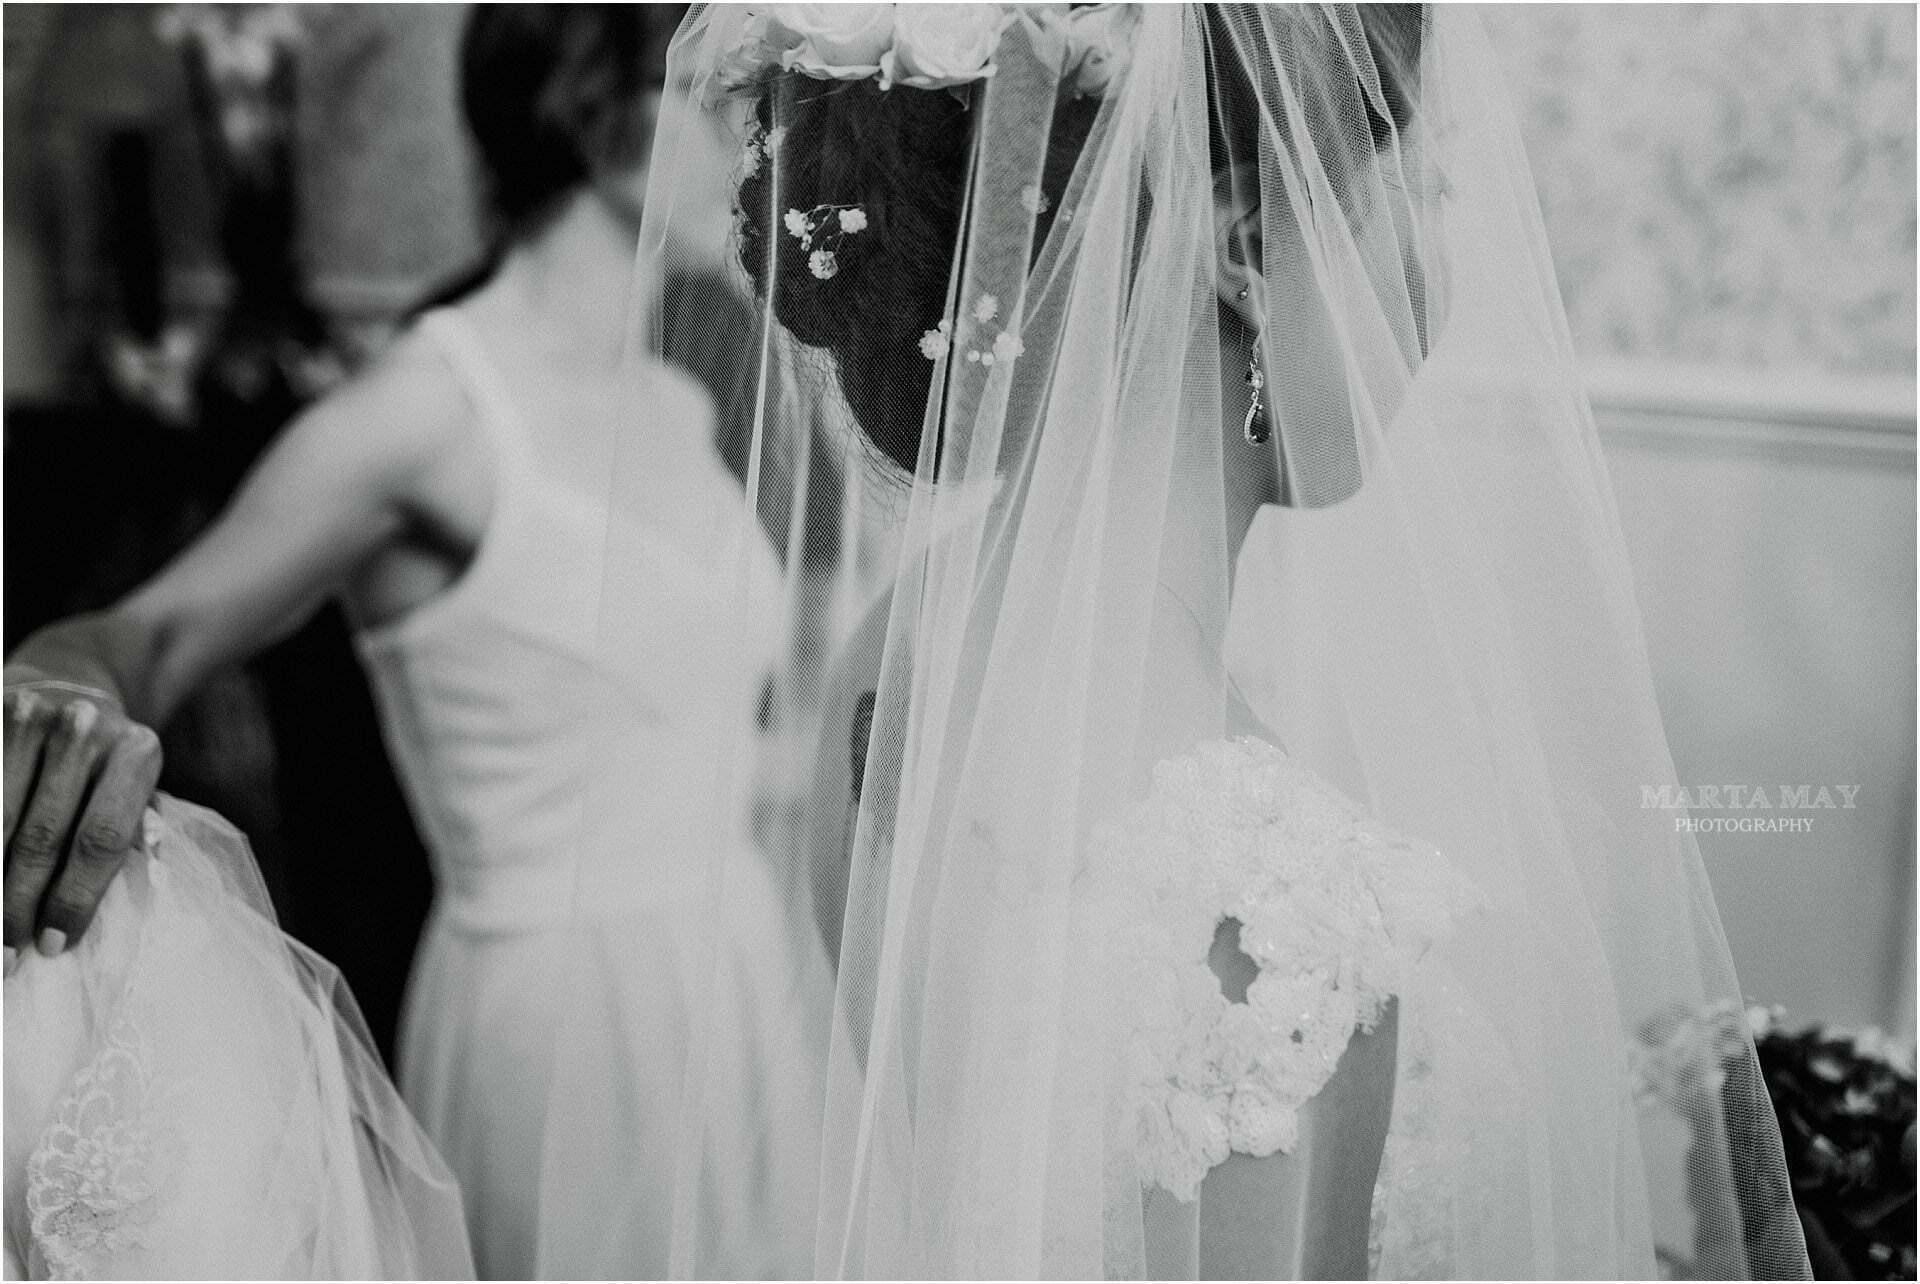 Lemore Manor wedding photographer Hereford